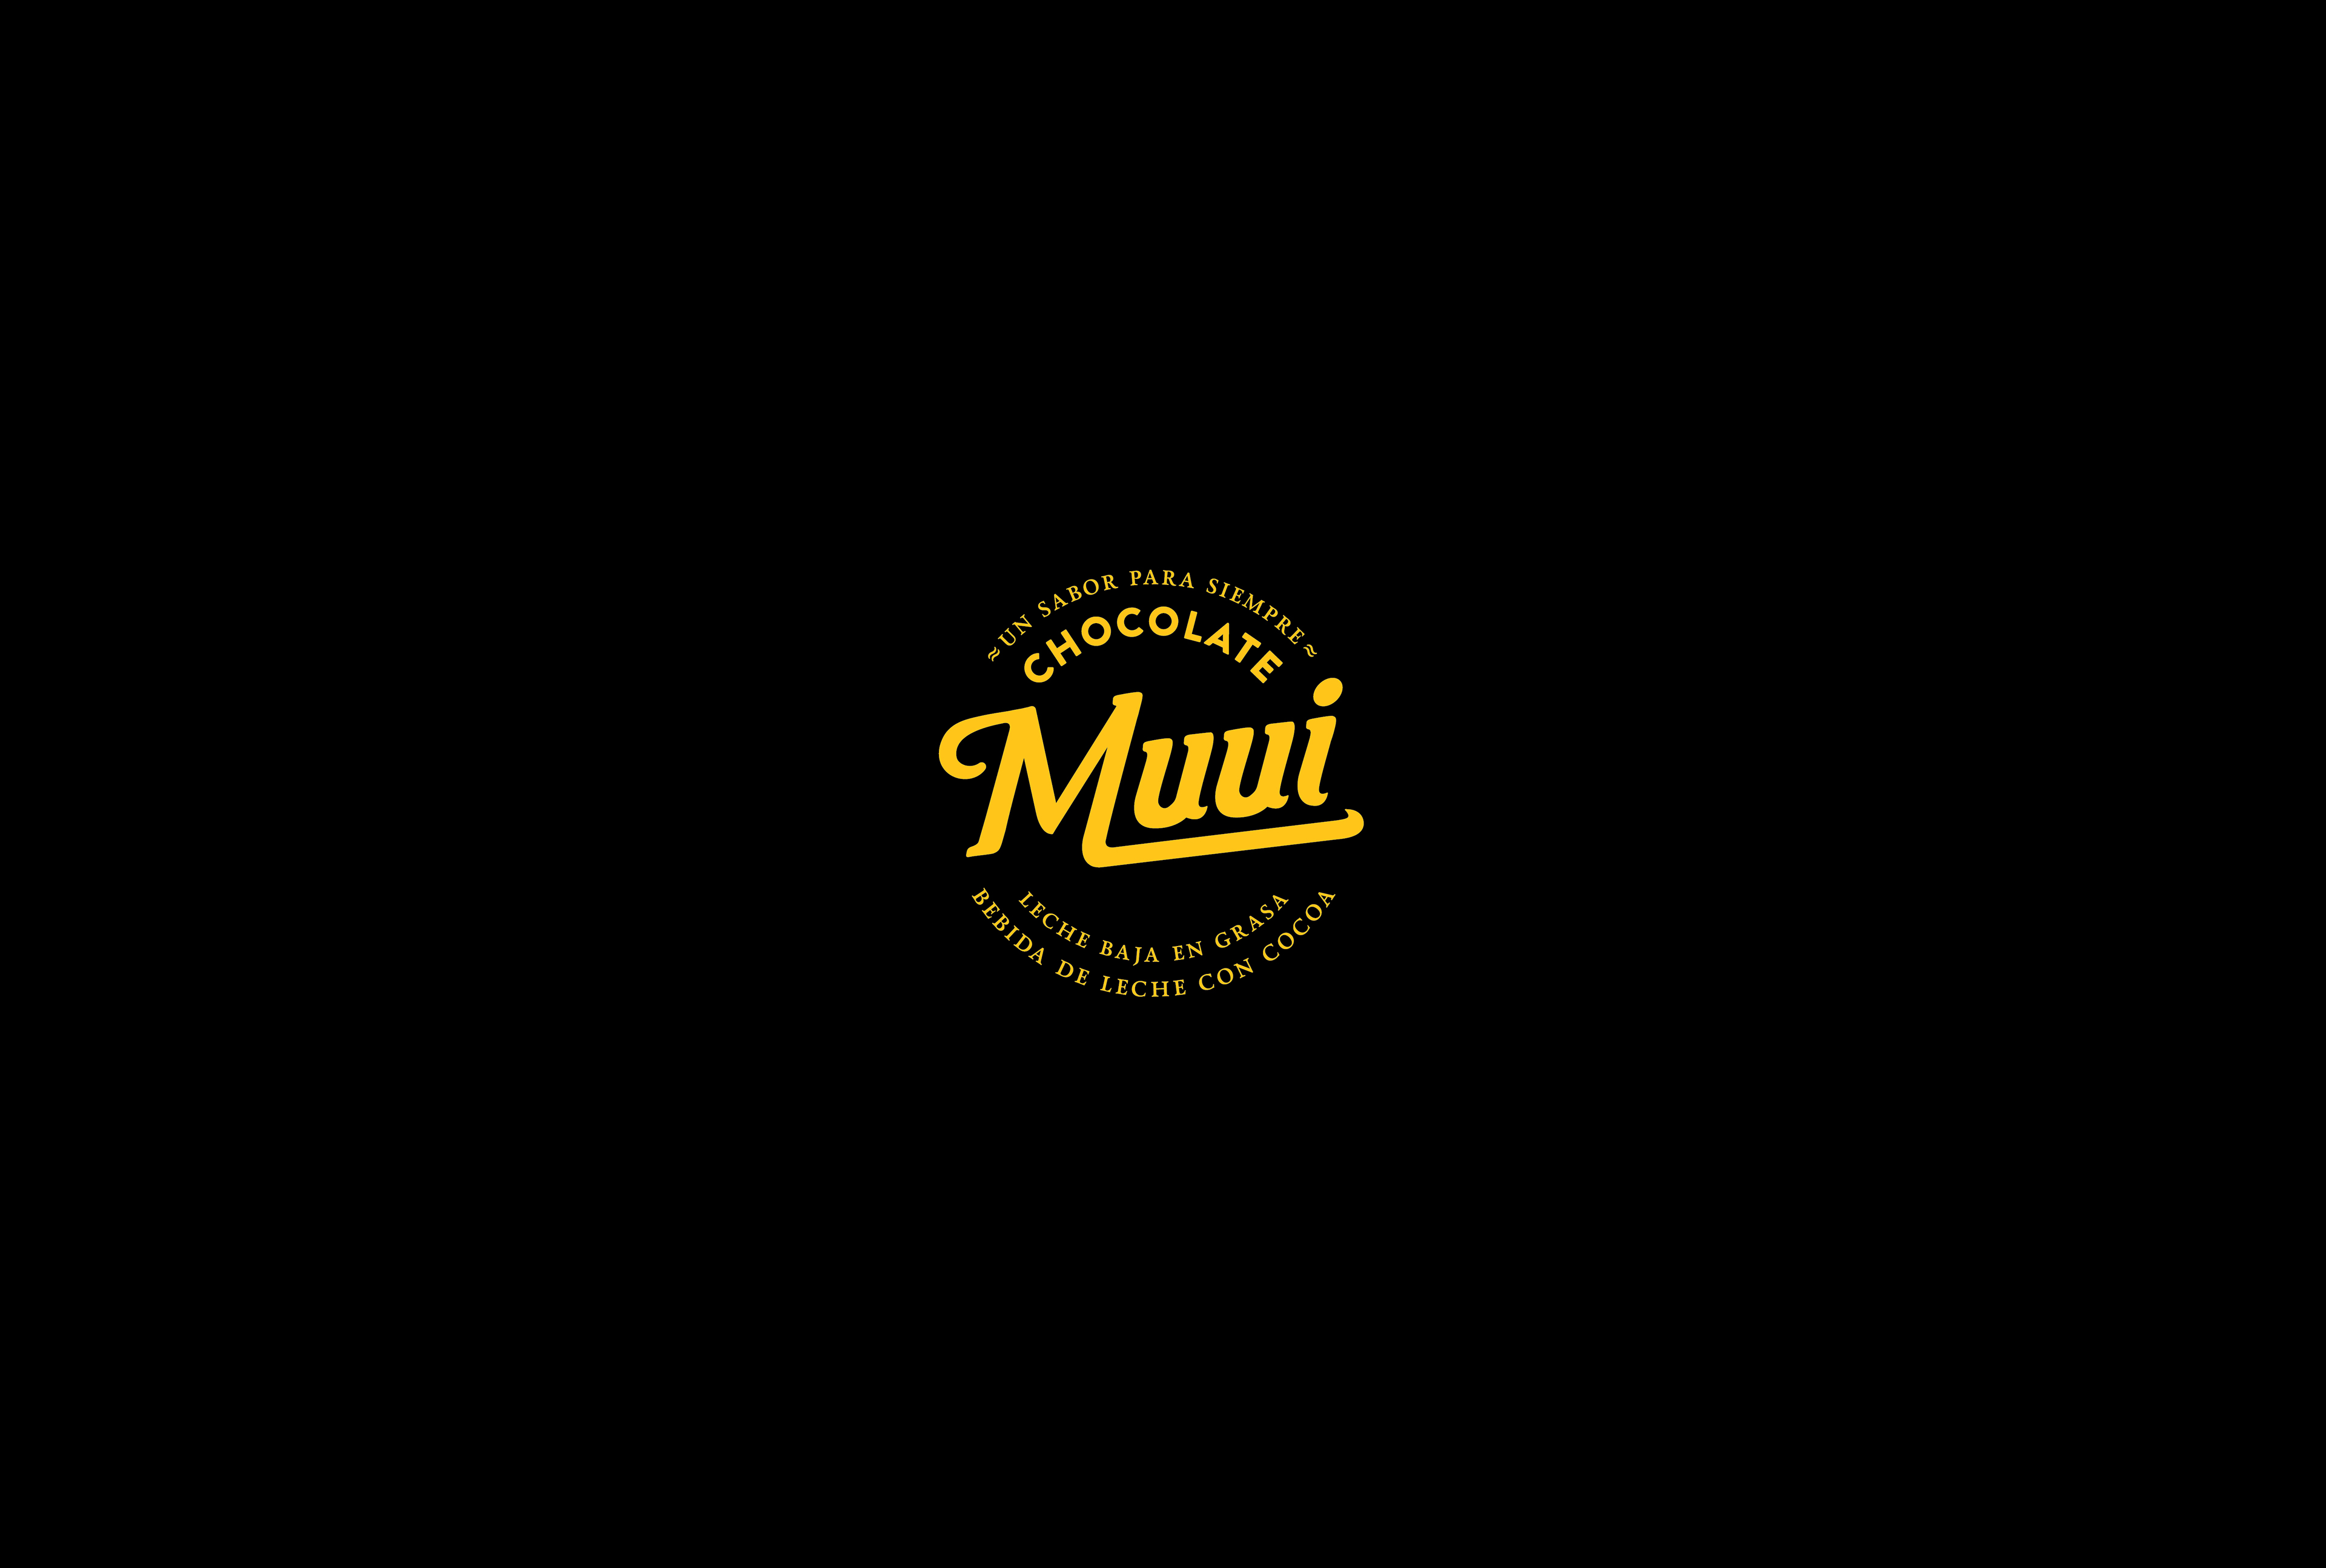 Muui's Branding